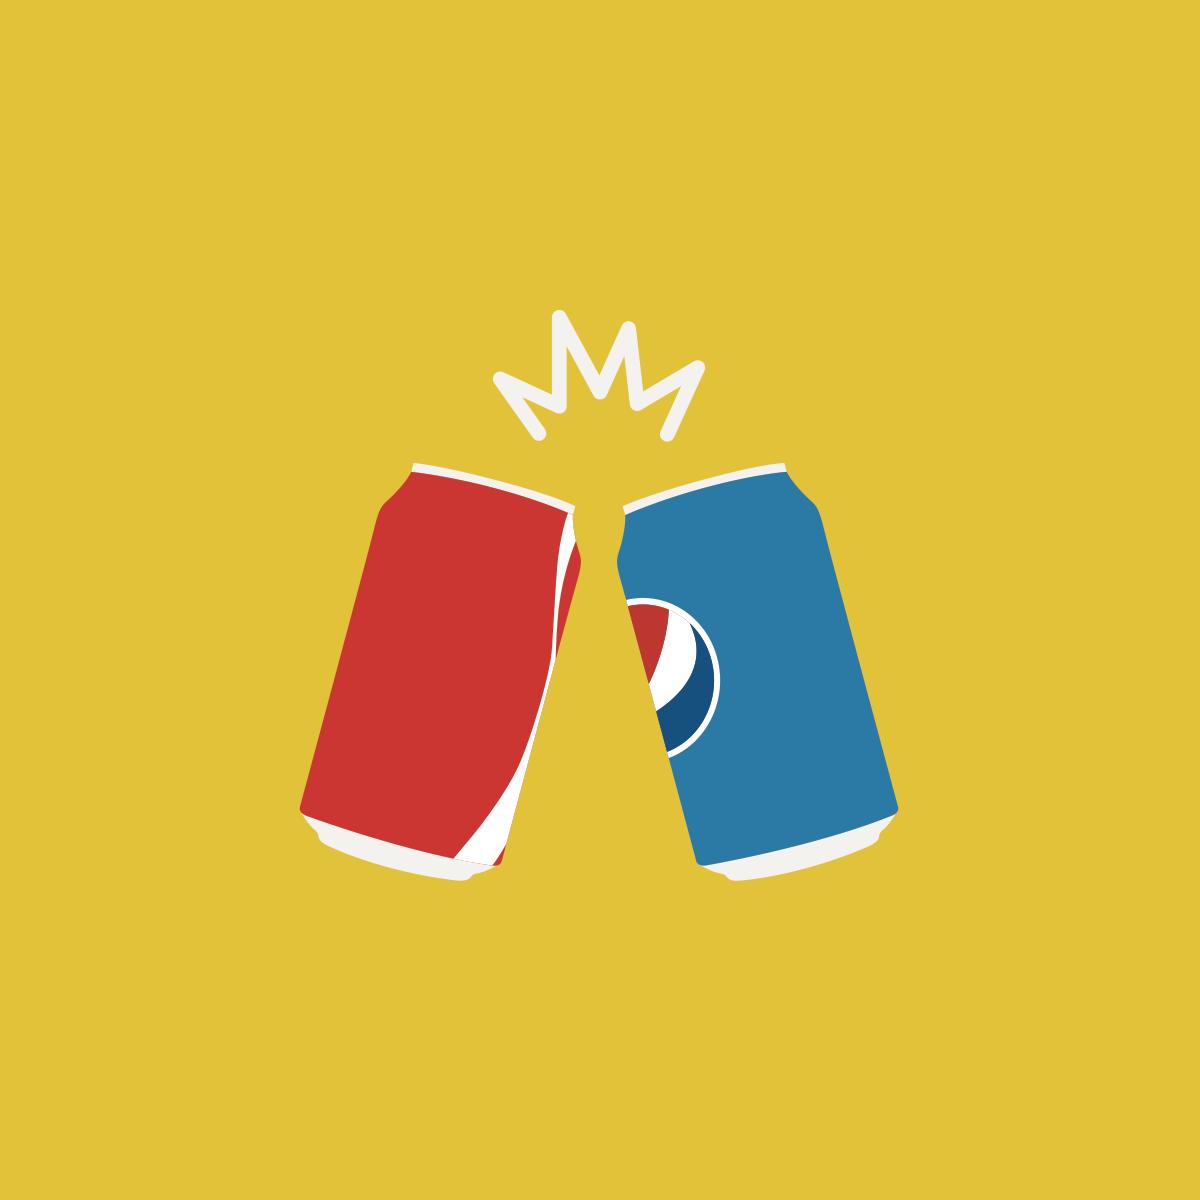 86 coke vs pepsi the cola wars